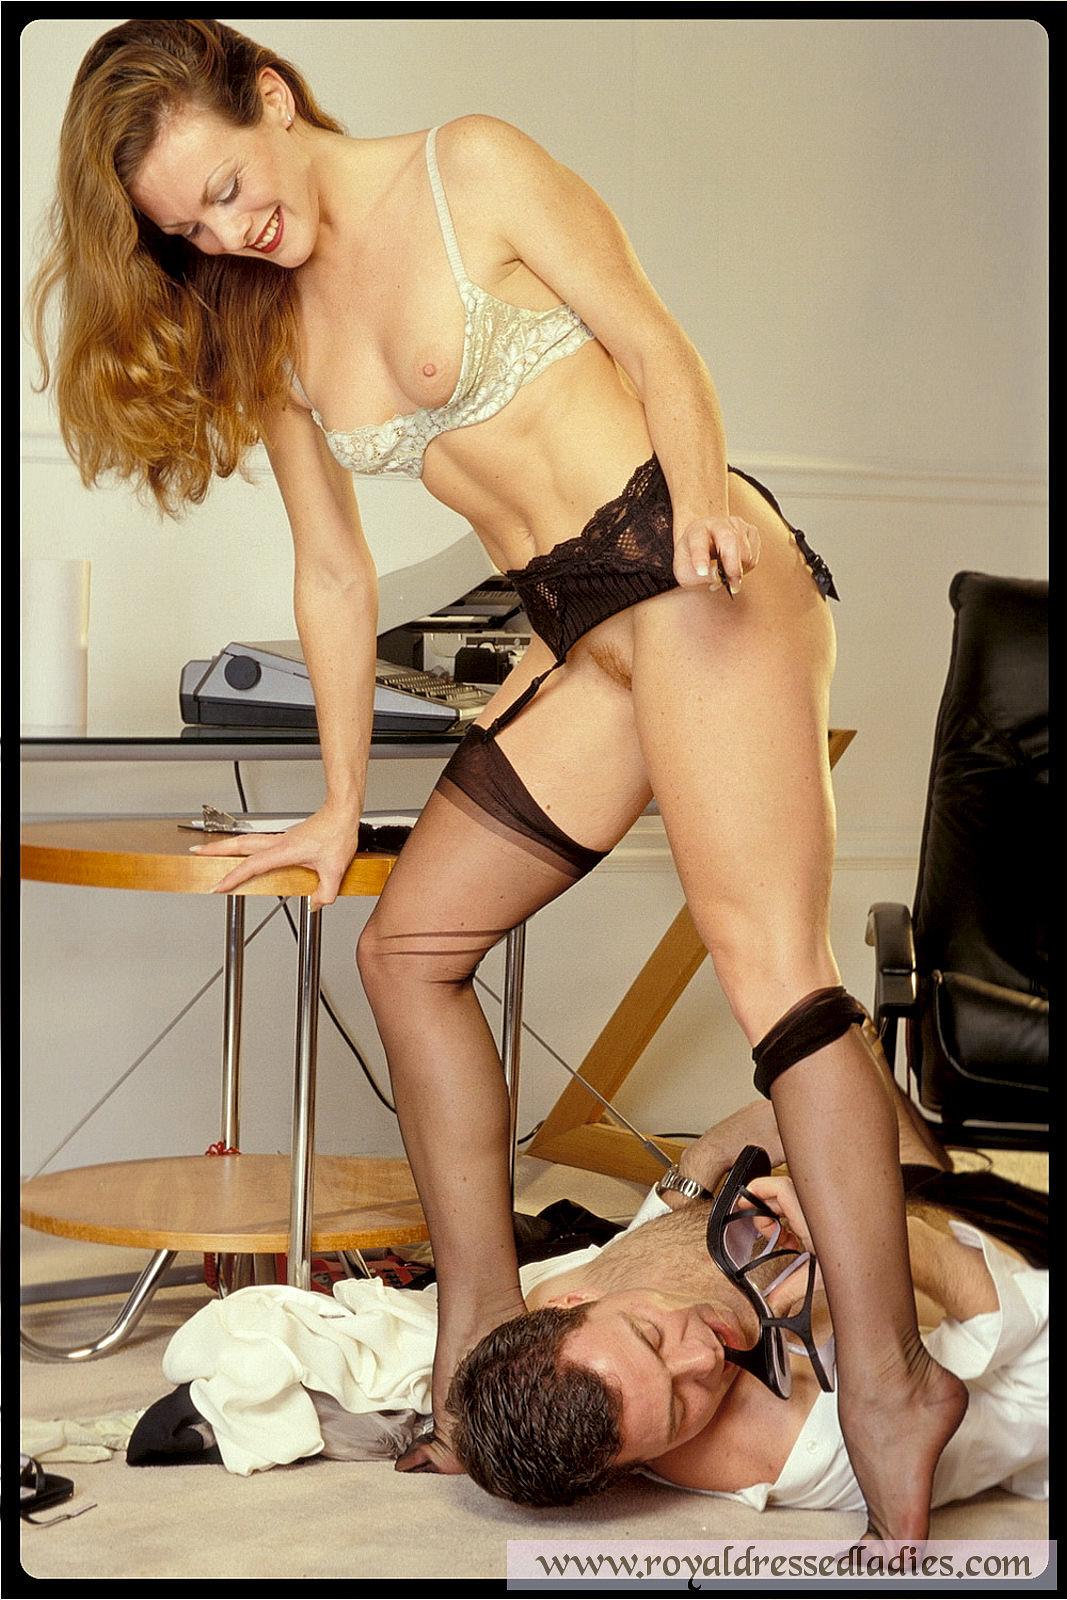 Hot European Bitch Gets A Cumshot Online XXX Sex Images